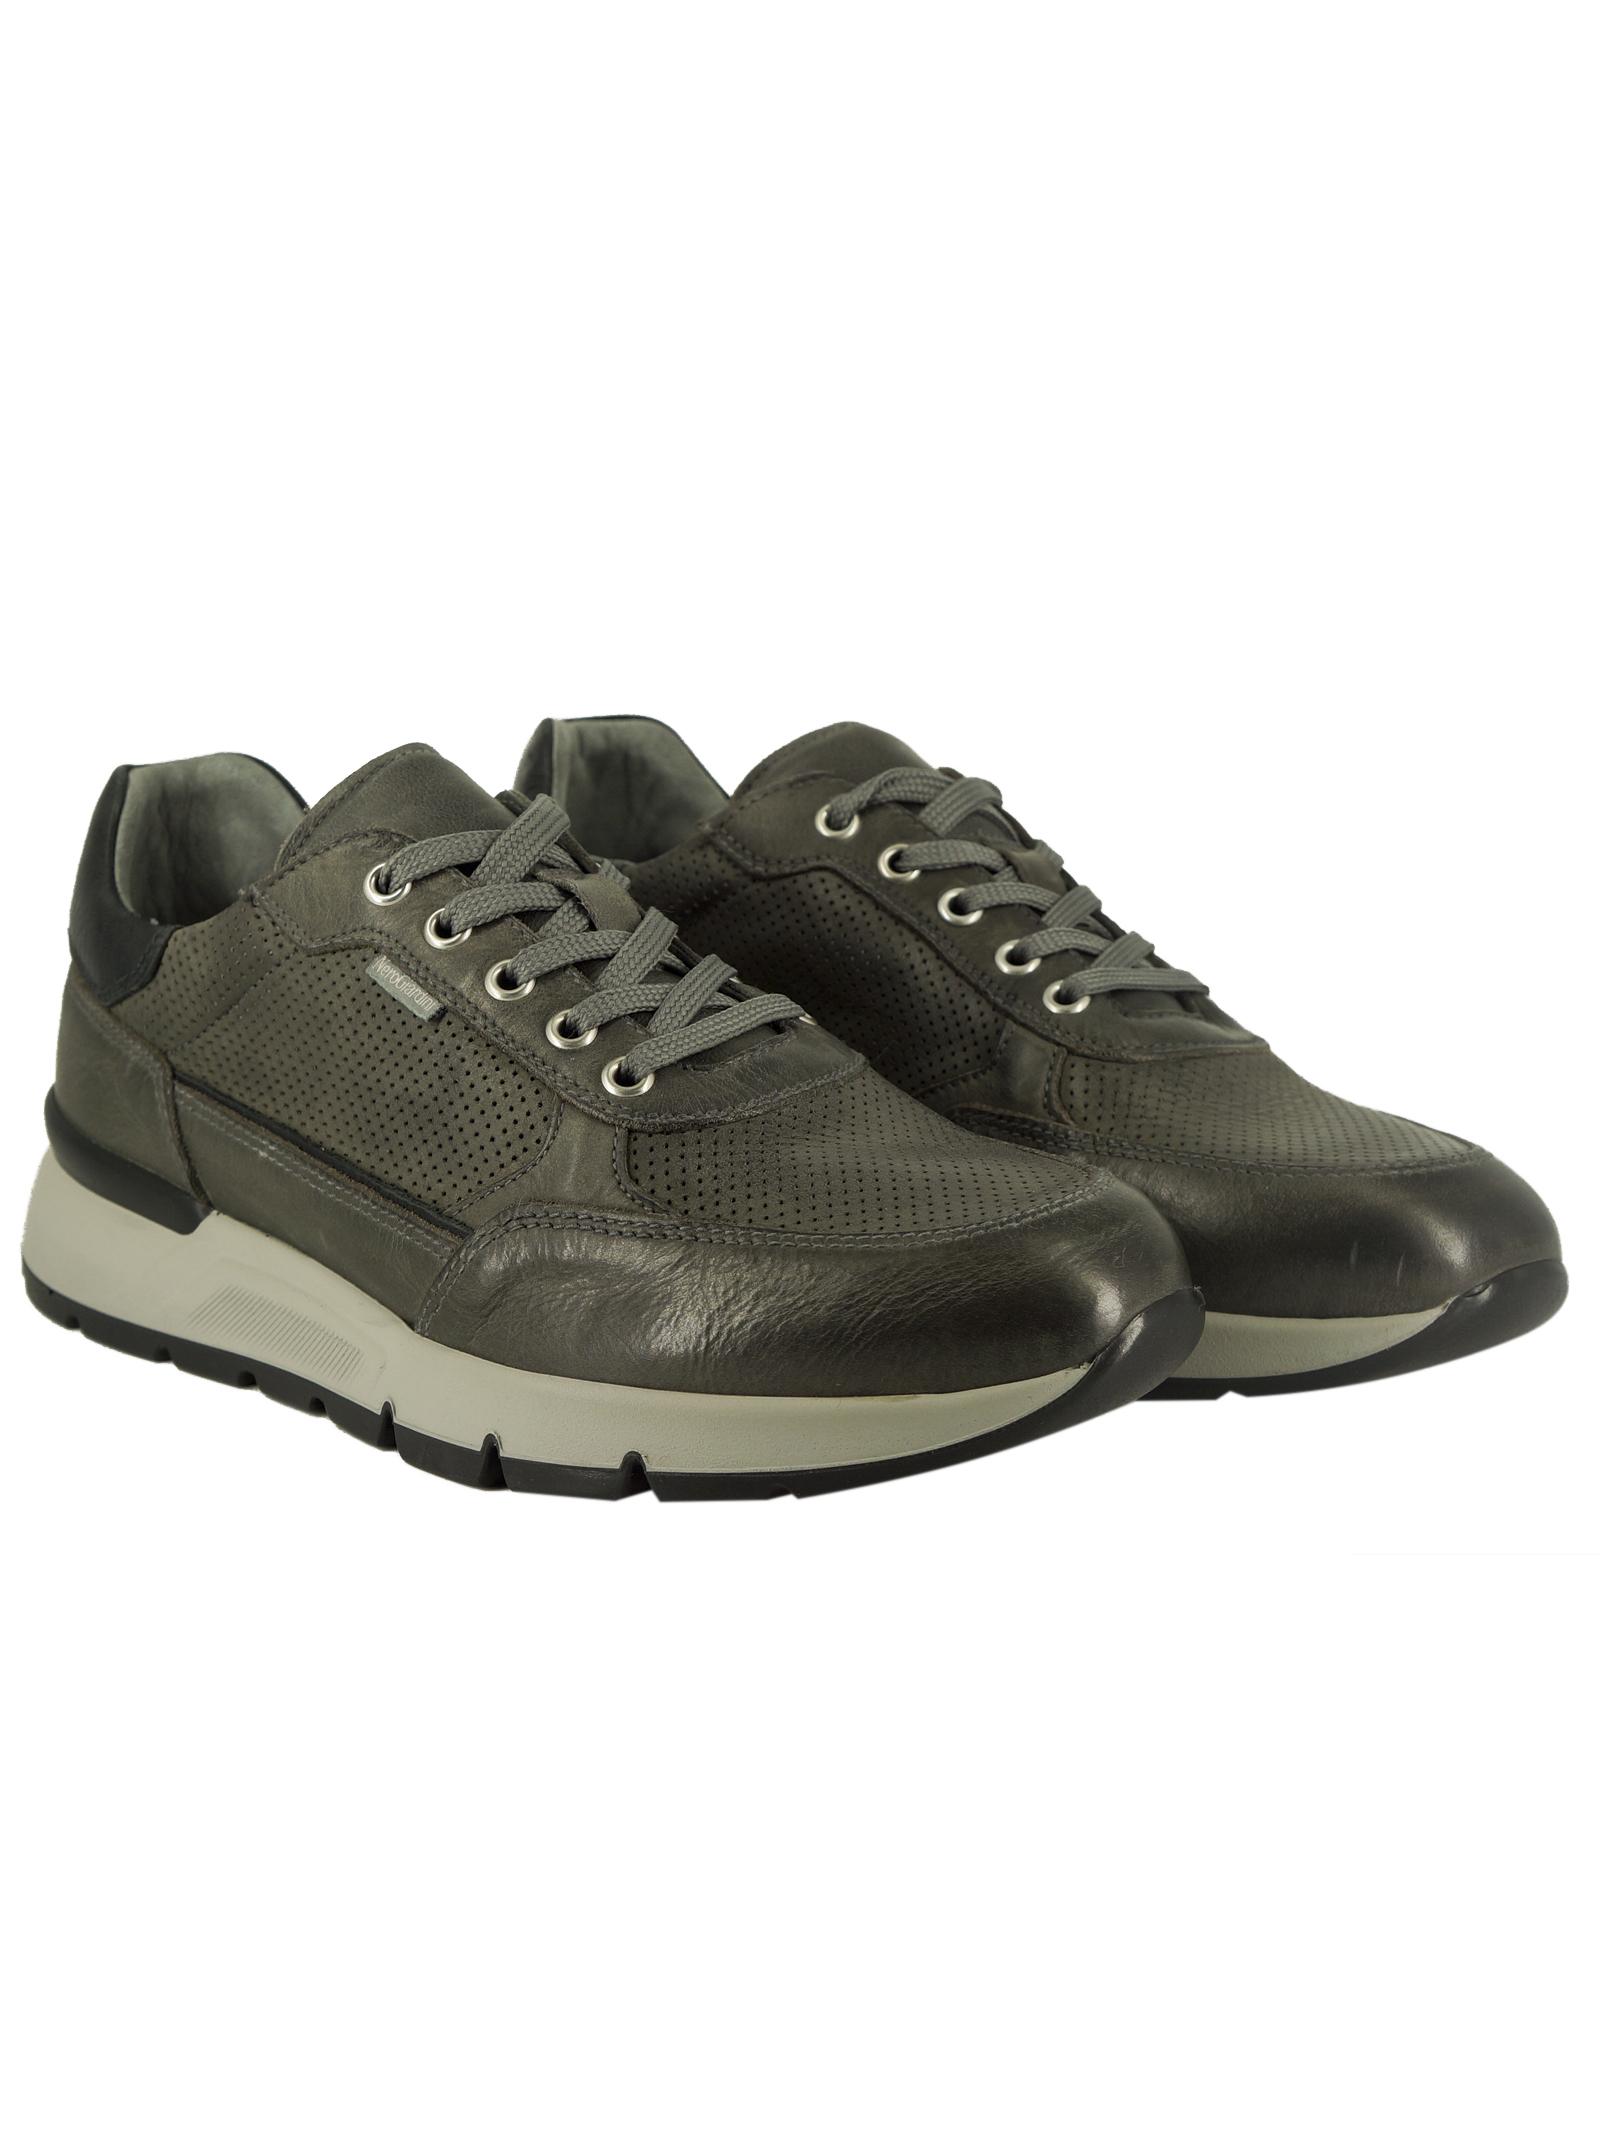 Sneakers Uomo in Pelle Nero Giardini Nero Giardini | Sneakers | E101991UGRIGIO105